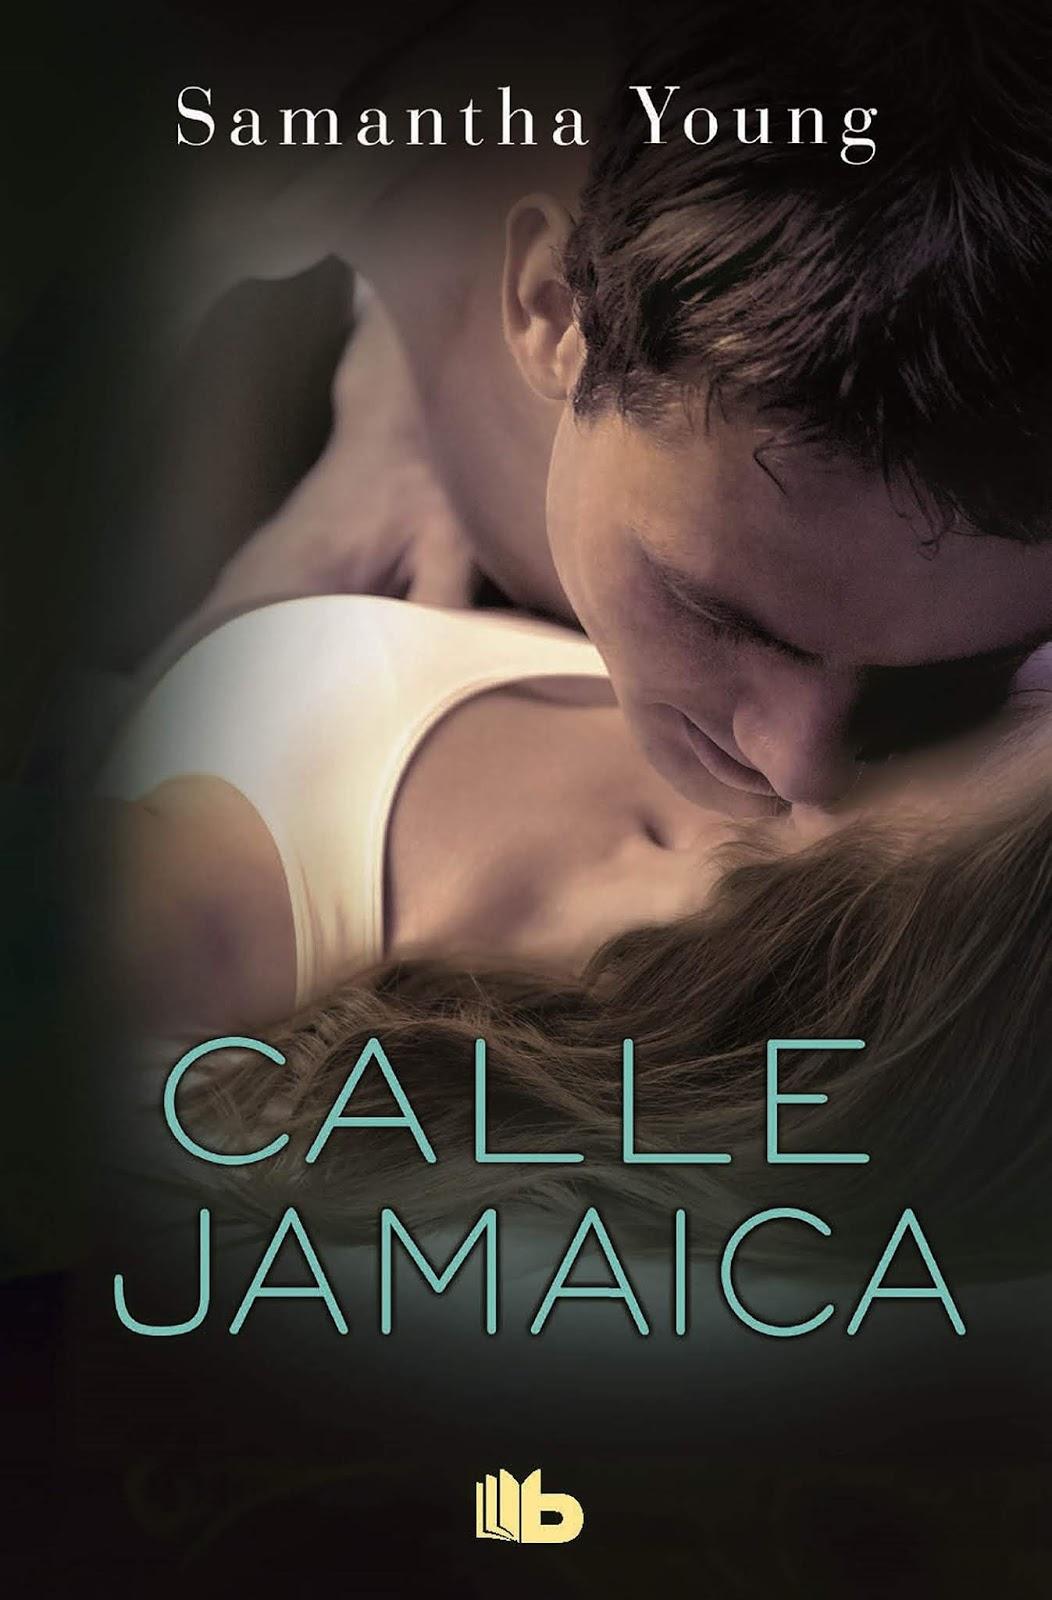 Calle Jamaica Samantha Young